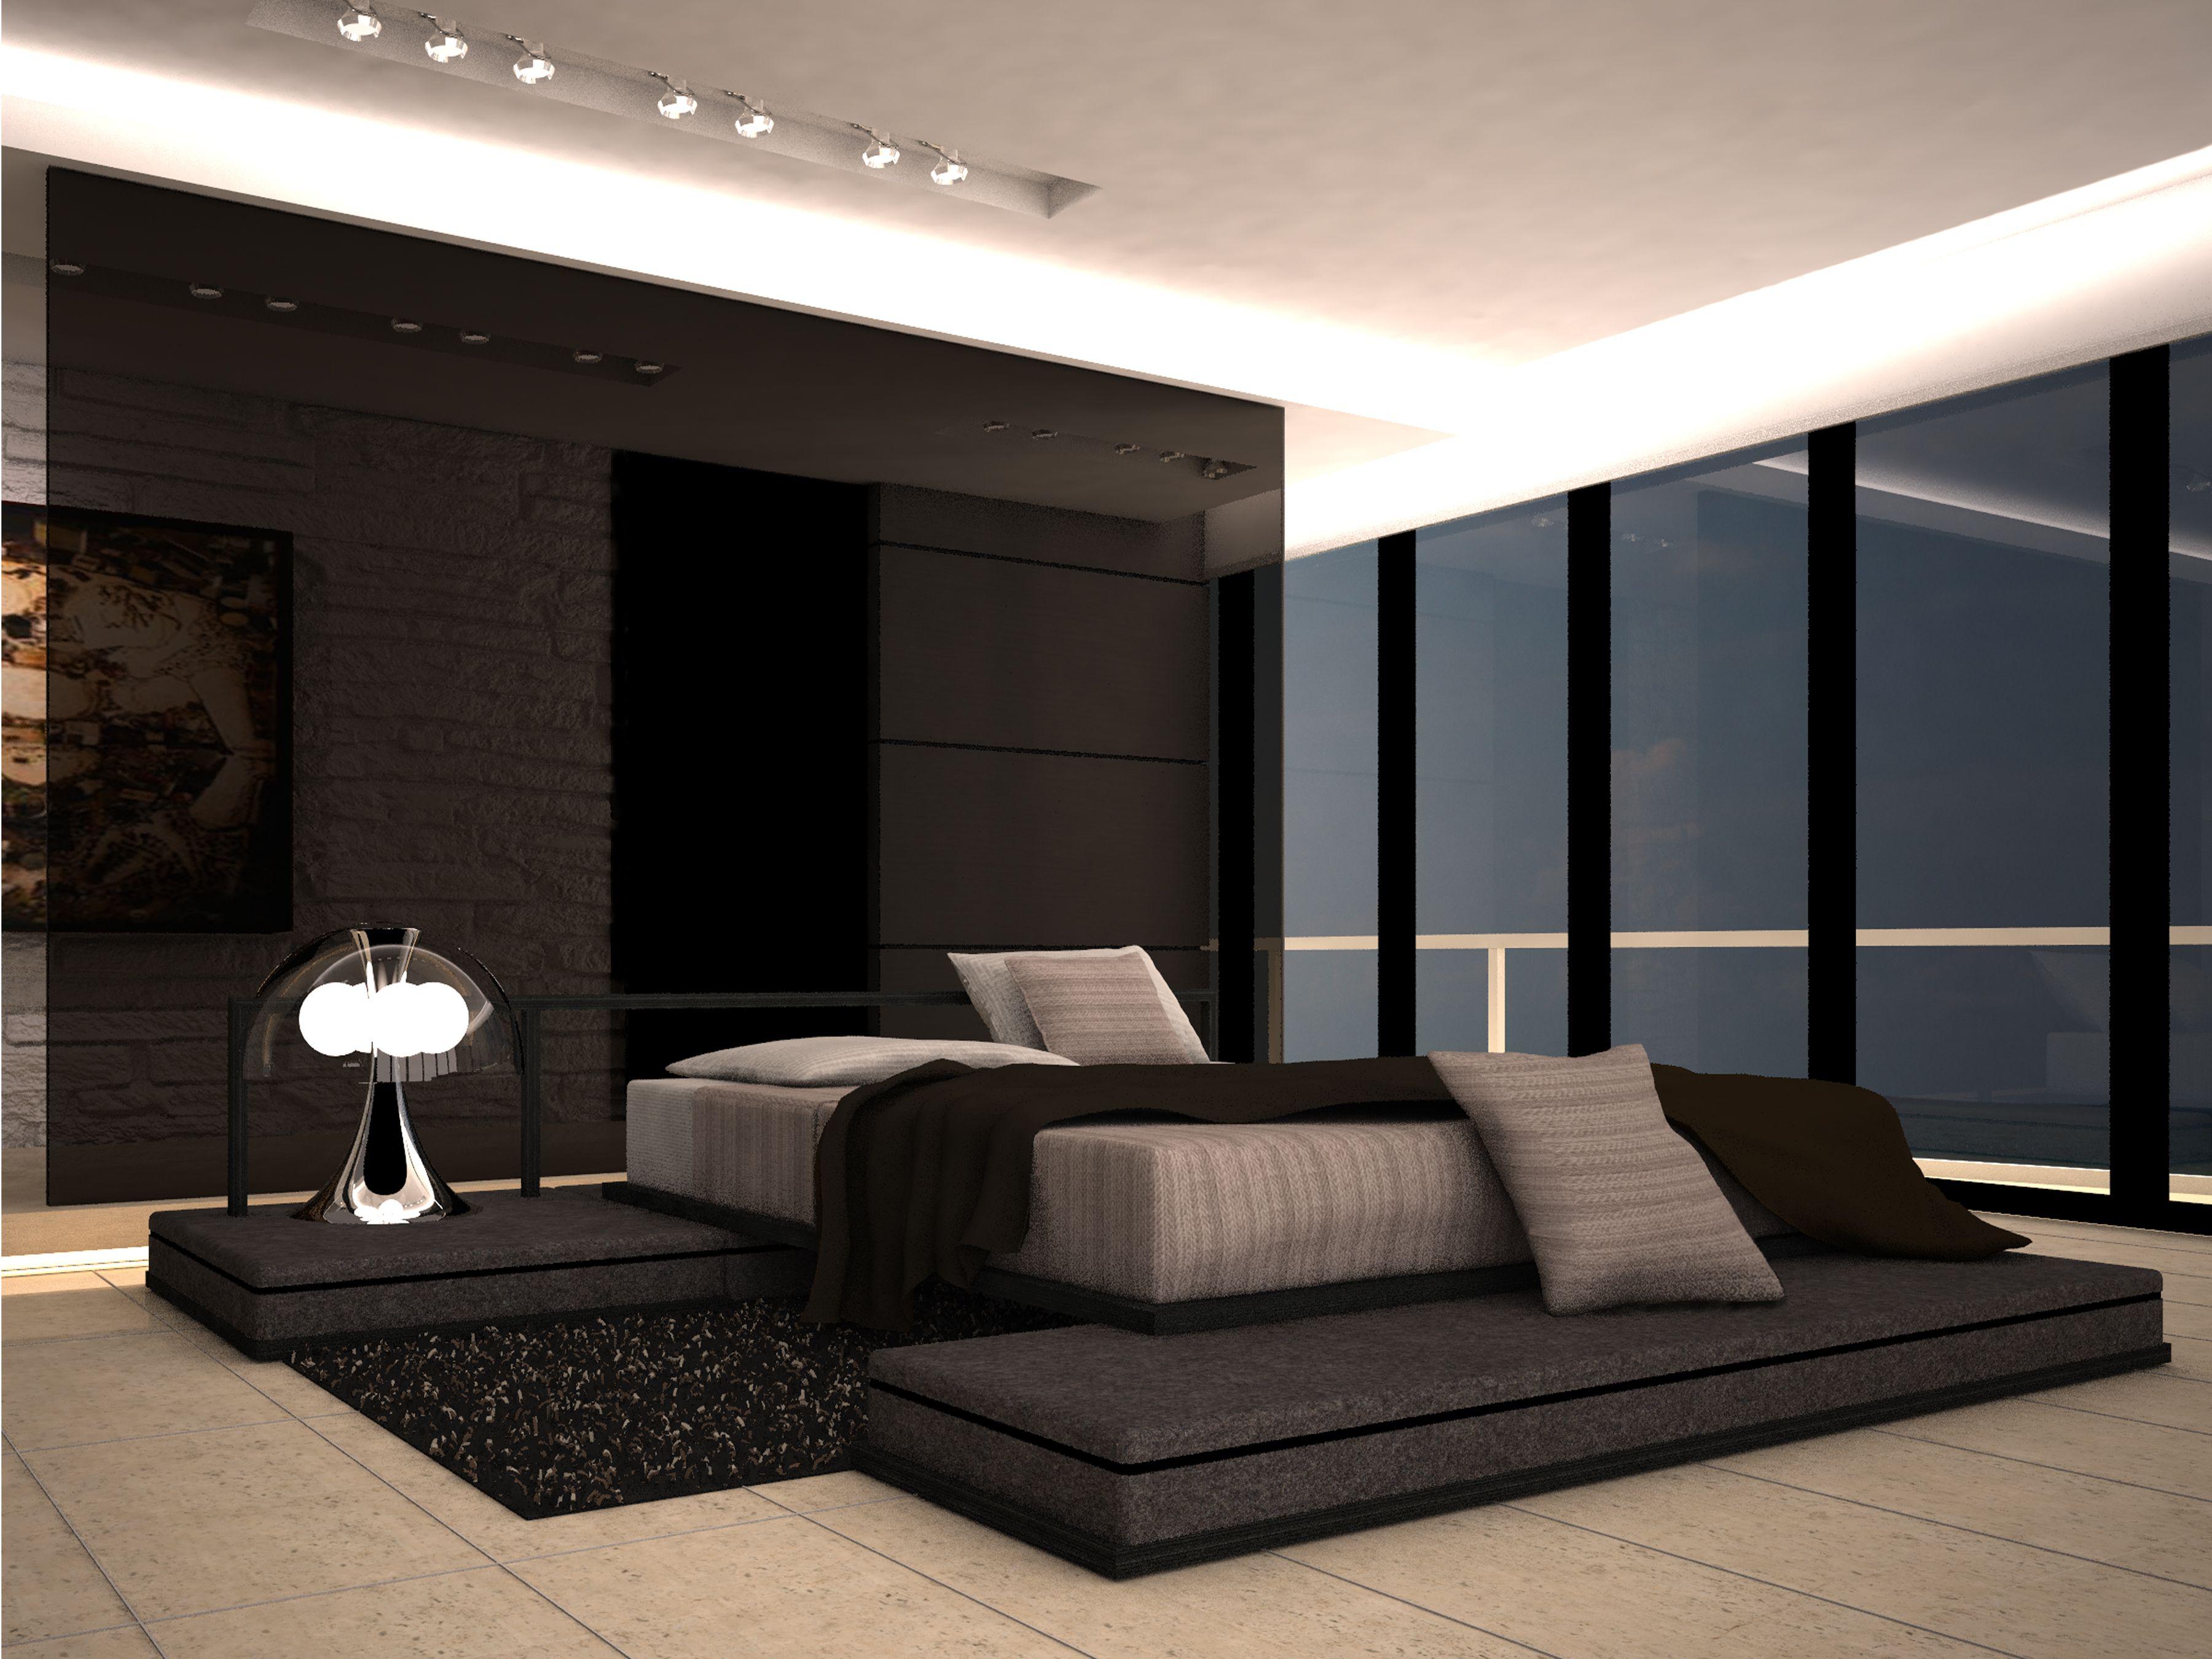 Gothic Bedroom Furniture For Sale. Infant Bedroom Furniture Best Bedroom. Gothic  Bedroom Gothic Bedroomjpg